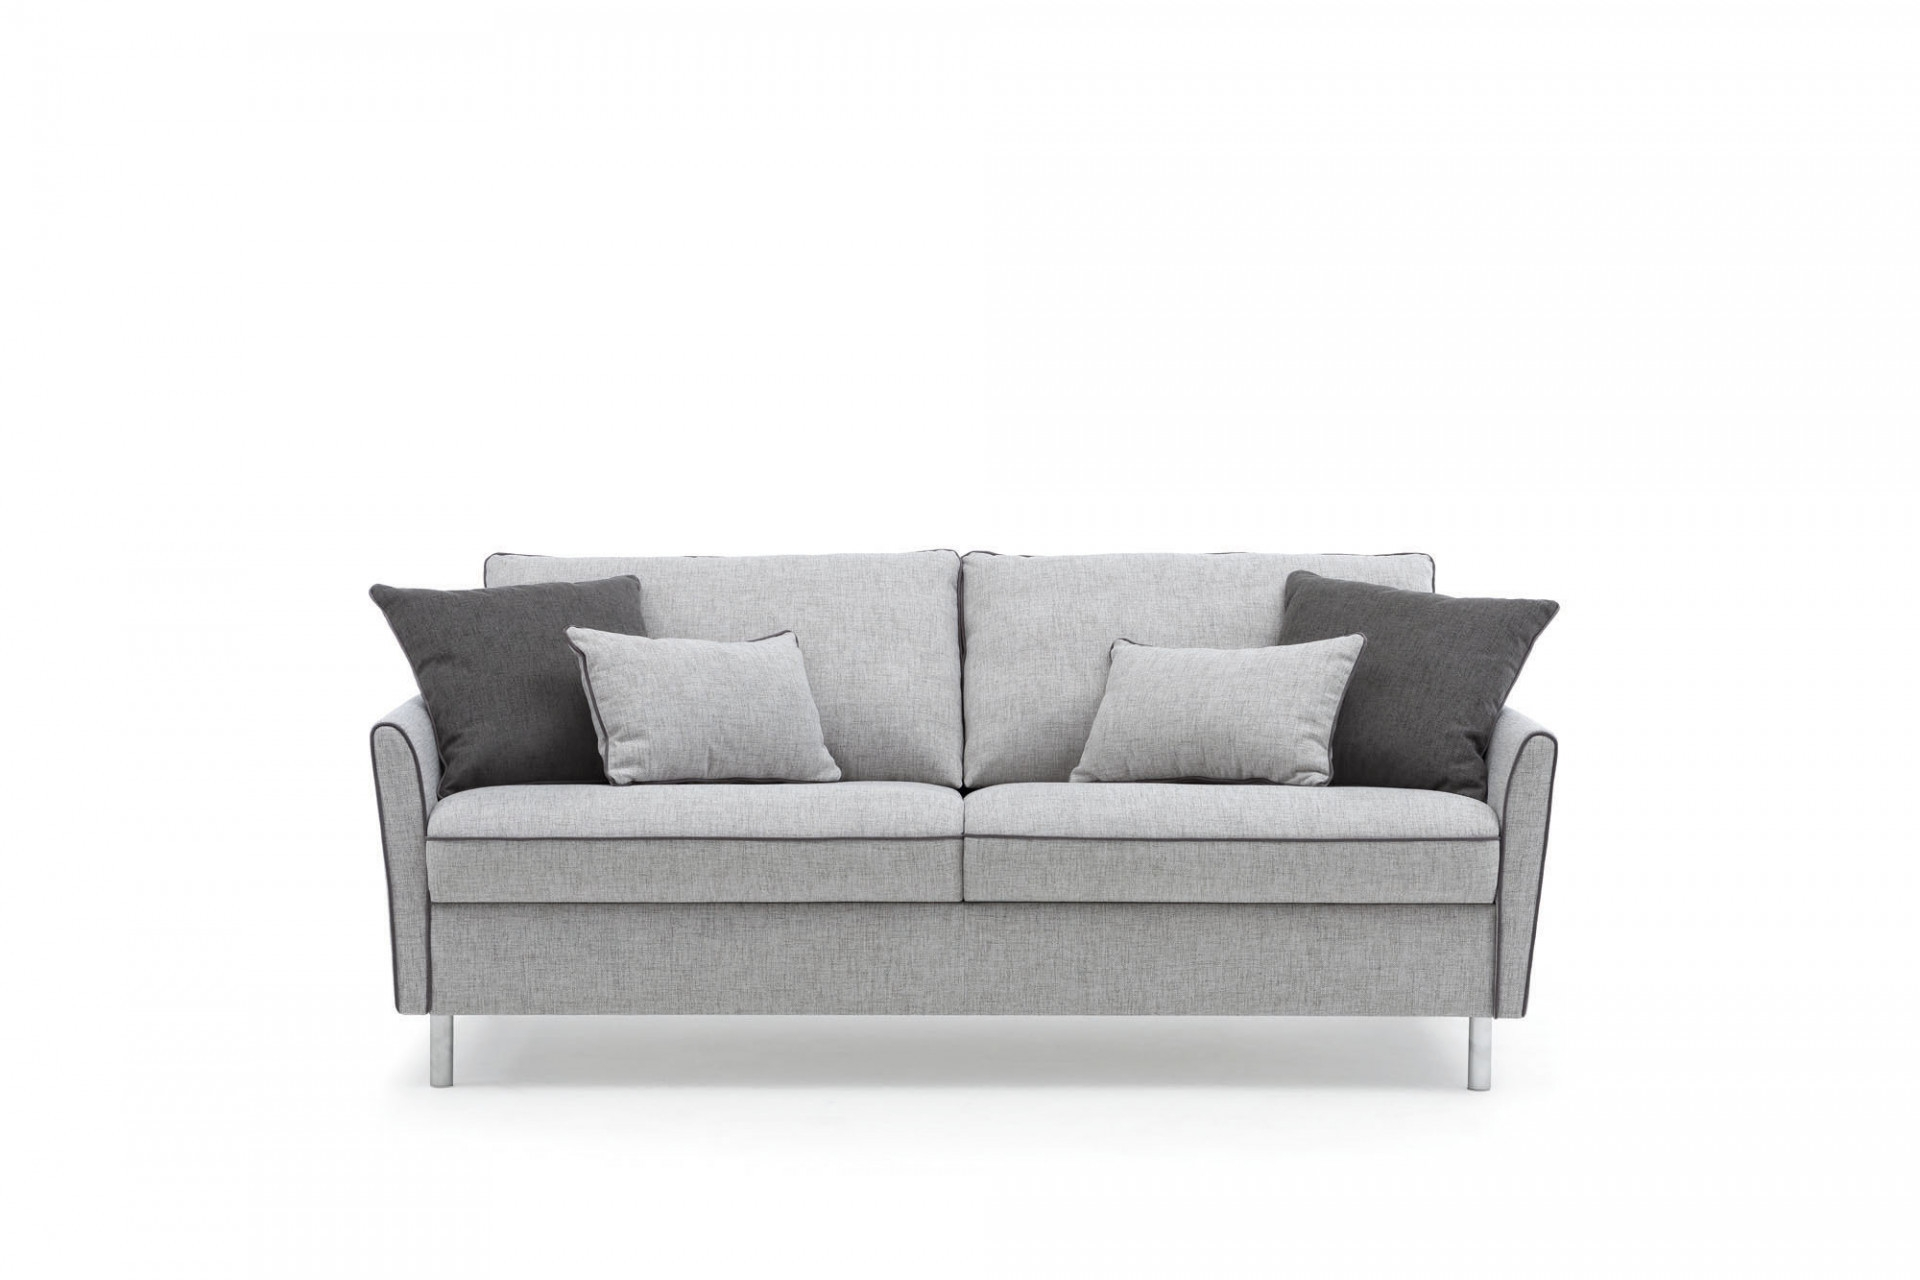 Canapea extensibila 3 locuri, tapitata cu stofa, Bali Gri, l202xA99xH90 cm